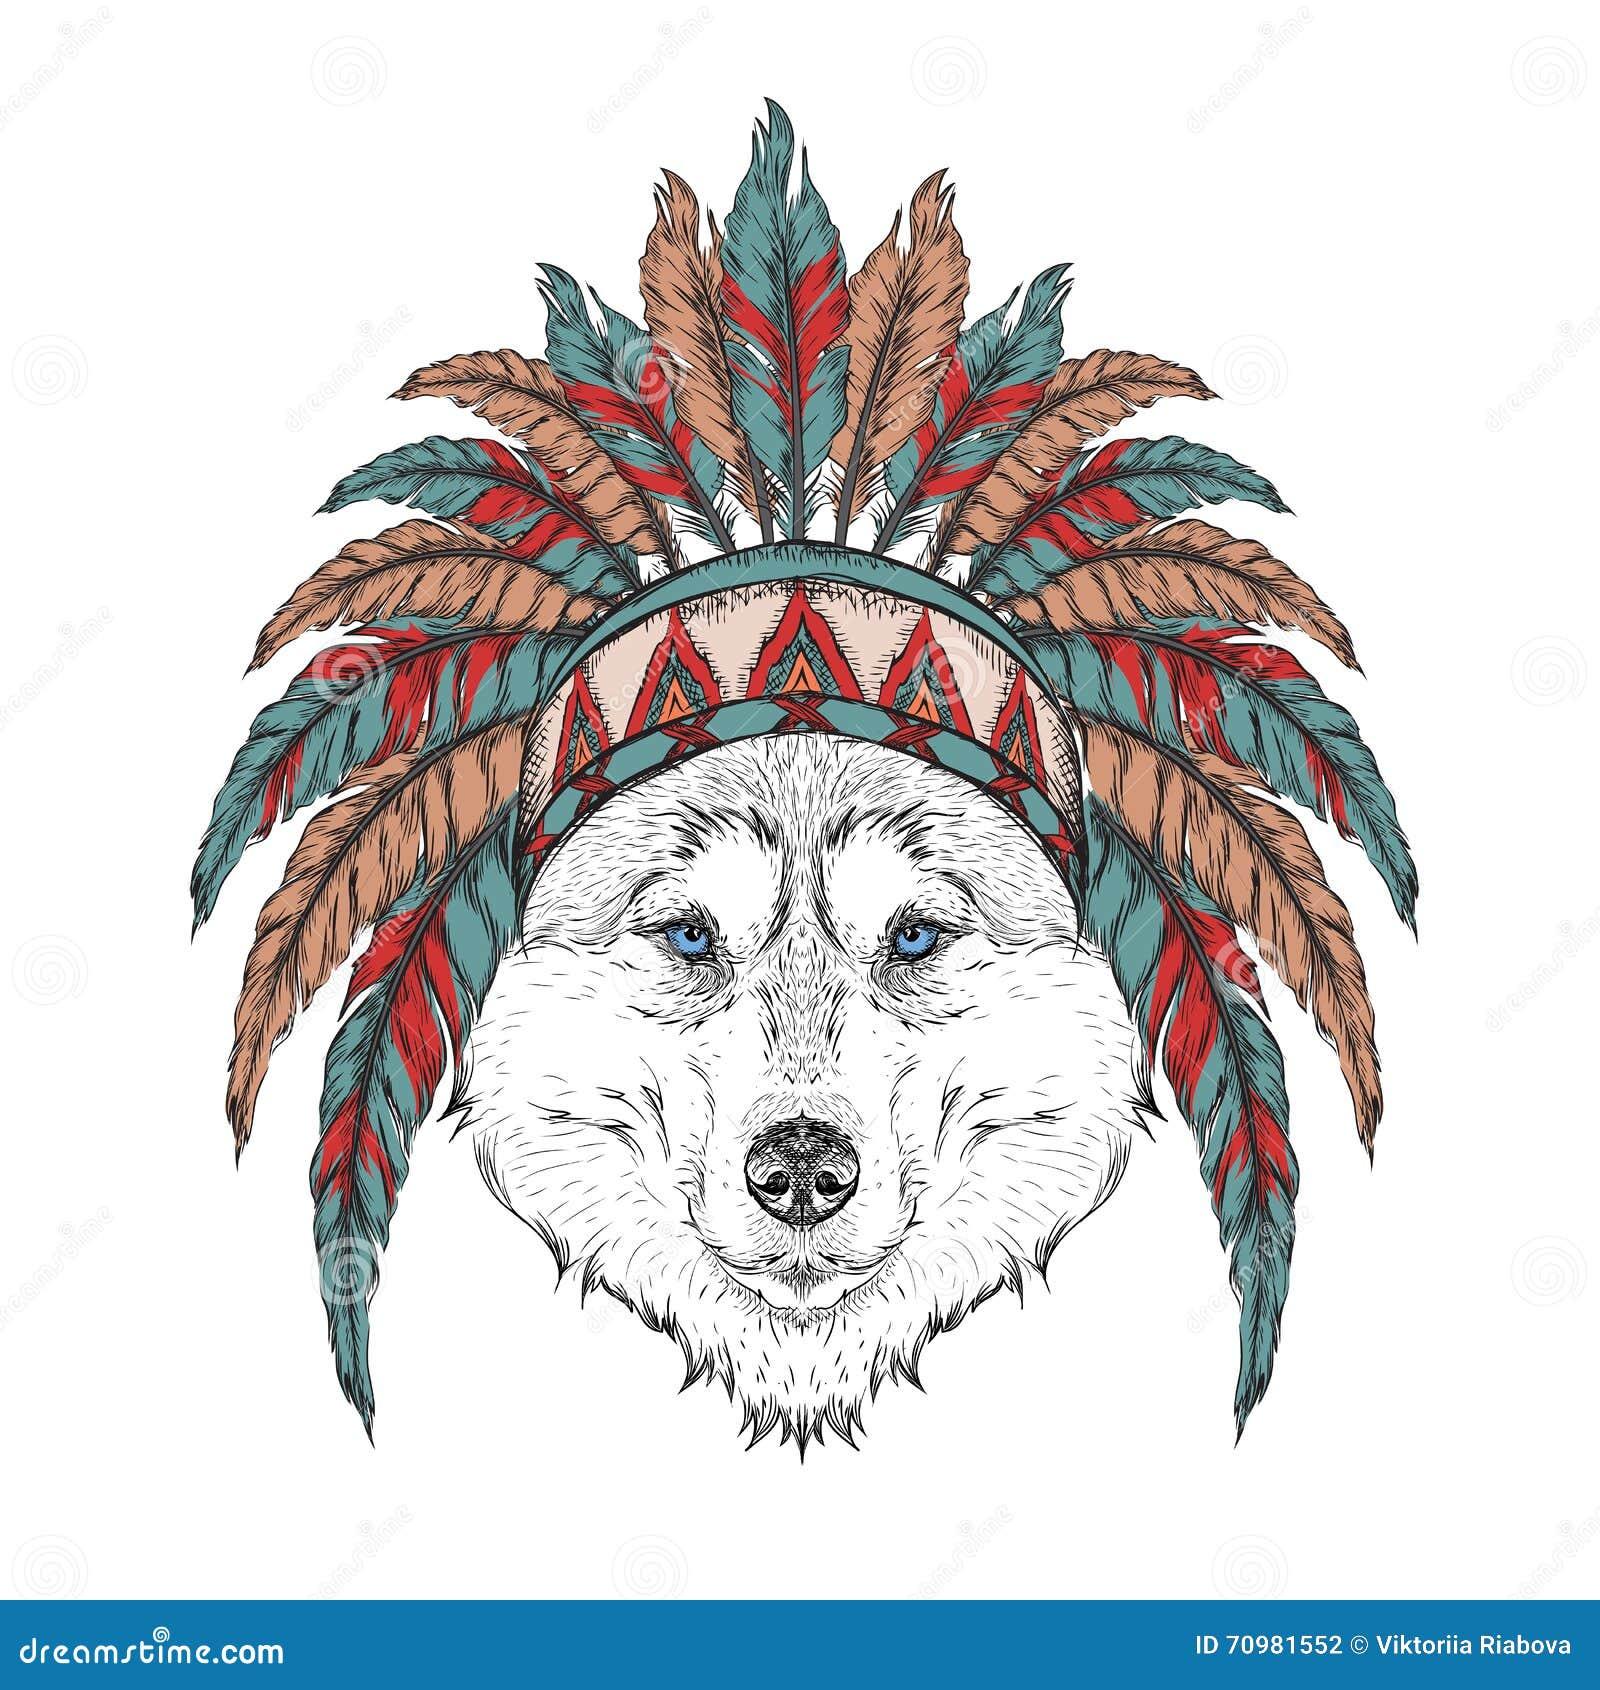 Tatouage indienne et loup galerie tatouage - Tatouage indien signification ...